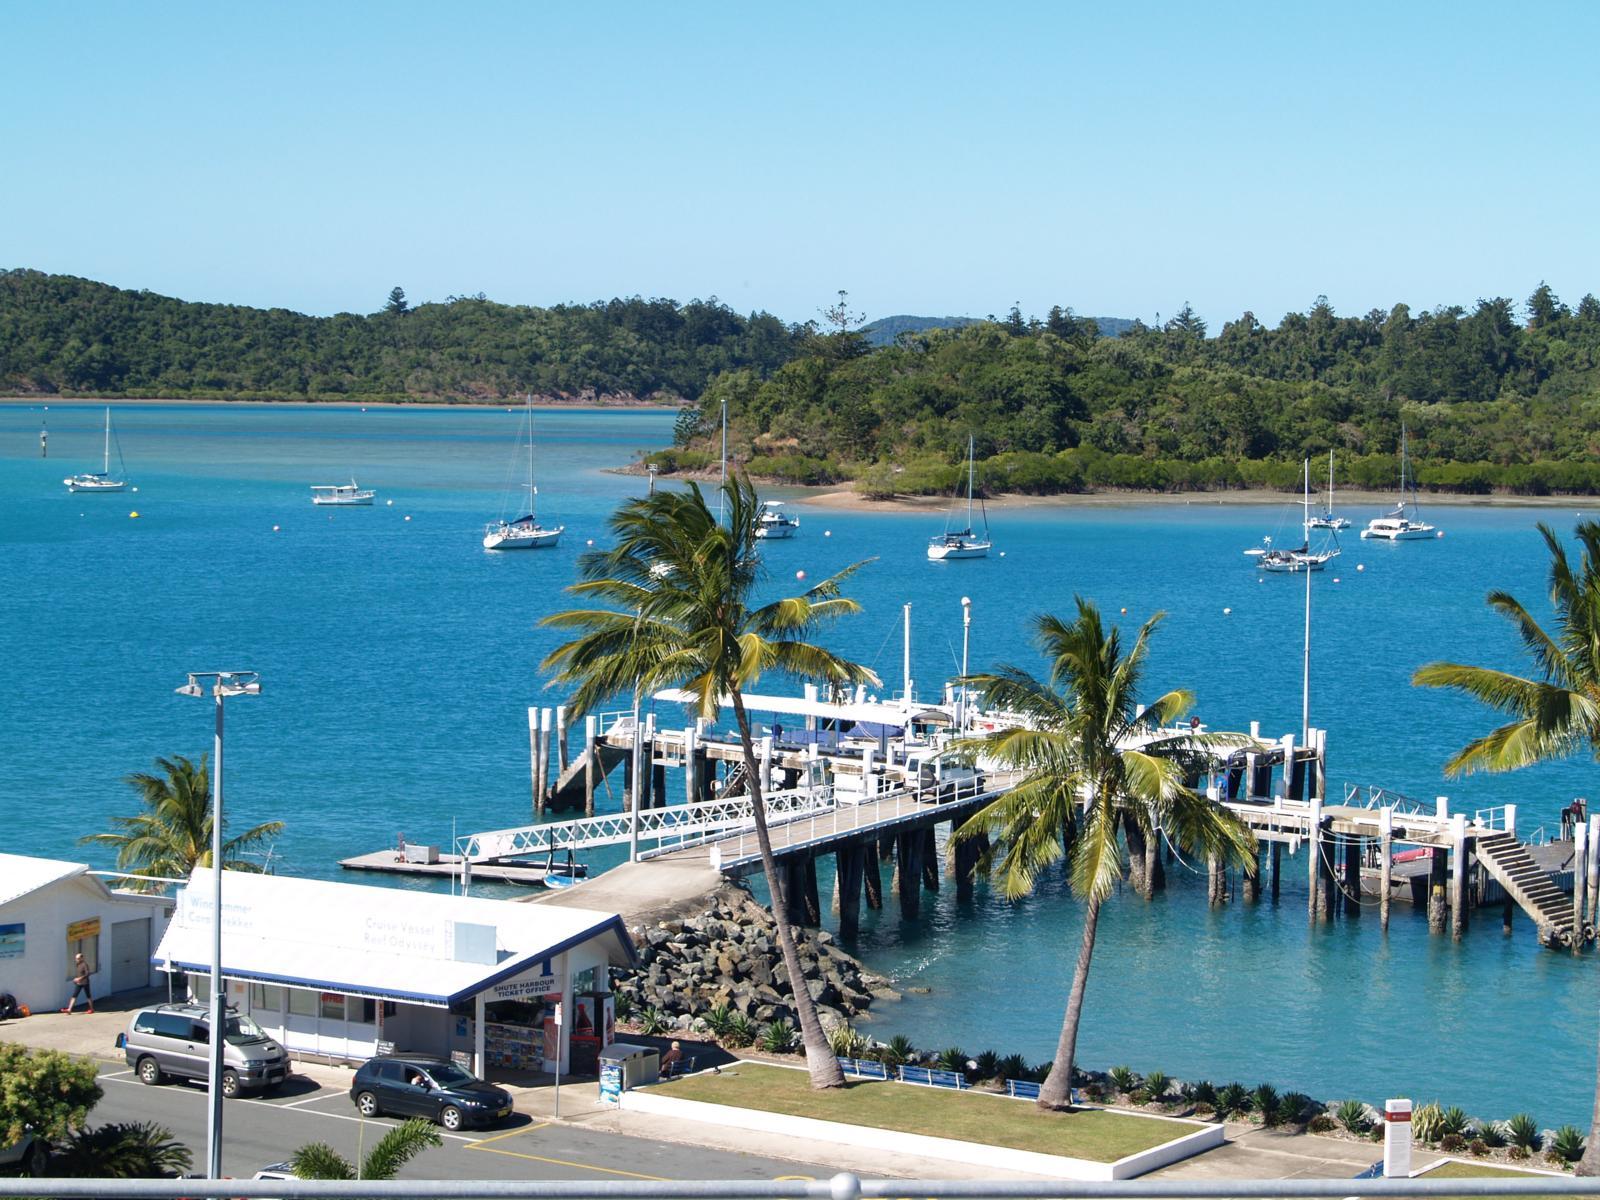 Gateway to the Whitsunday Islands